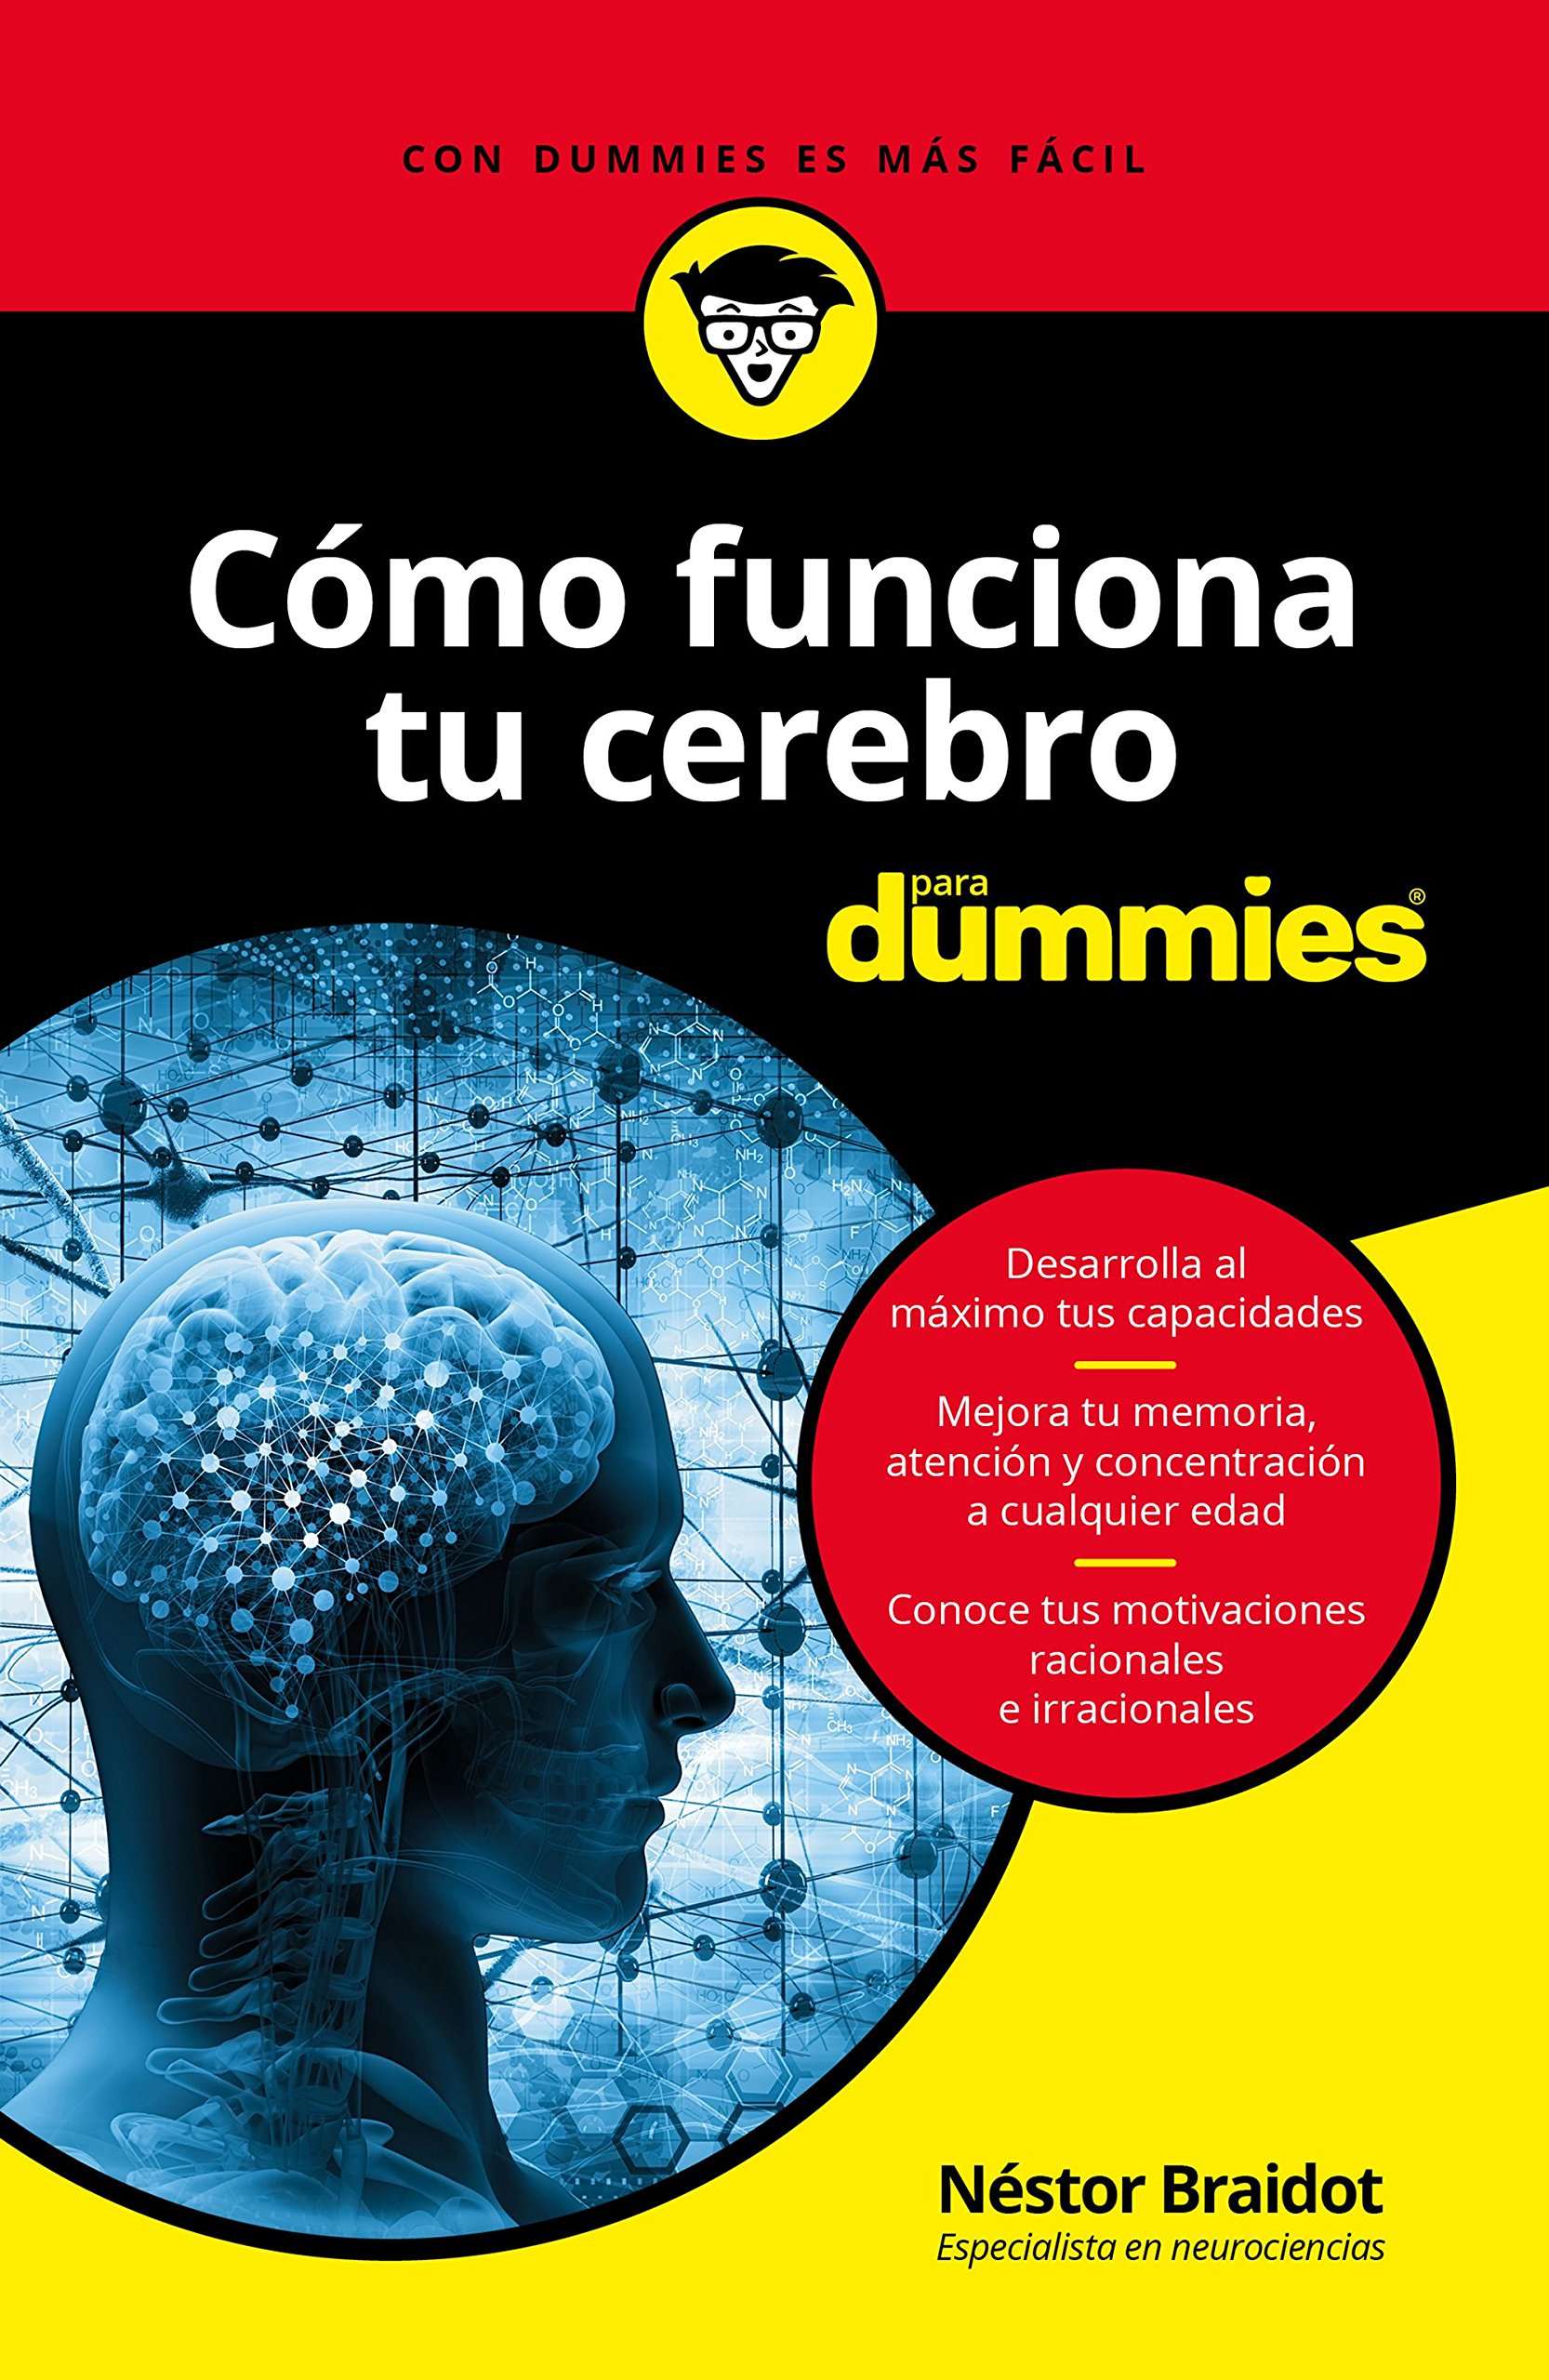 Cómo funciona tu cerebro para Dummies Tapa blanda – 5 abr 2018 Néstor Braidot 8432904457 Psychology